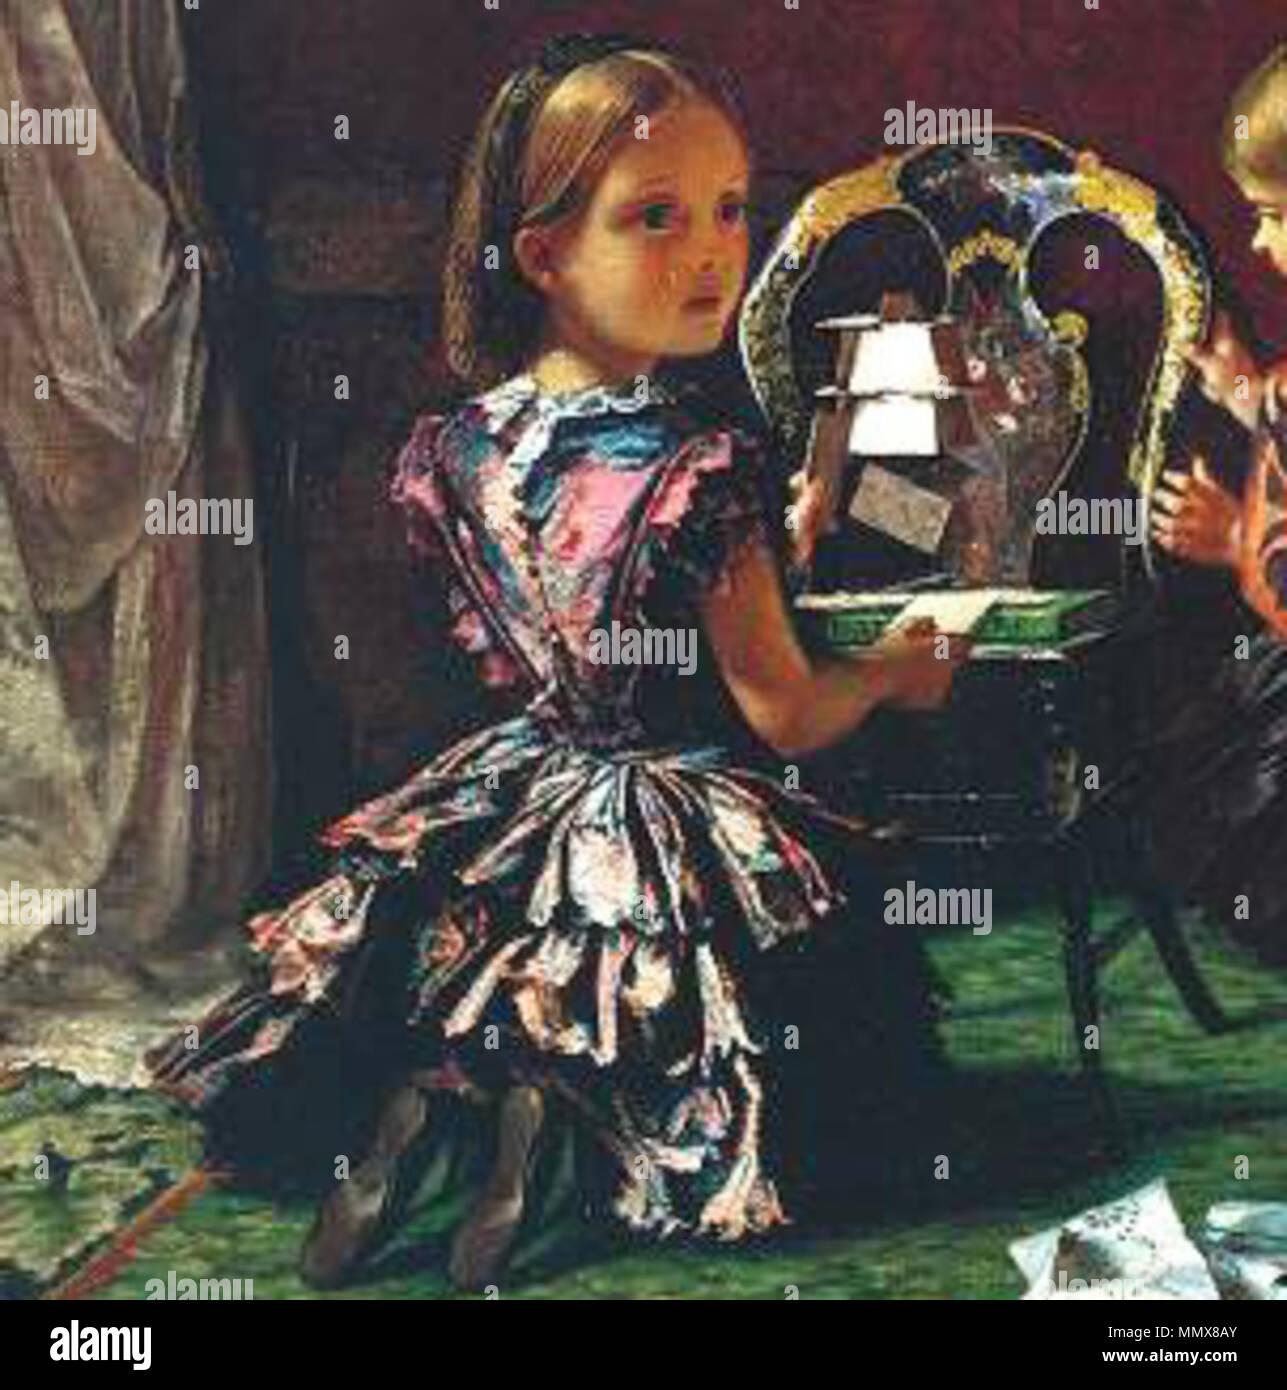 Ellen Jane Stockfotos & Ellen Jane Bilder - Alamy